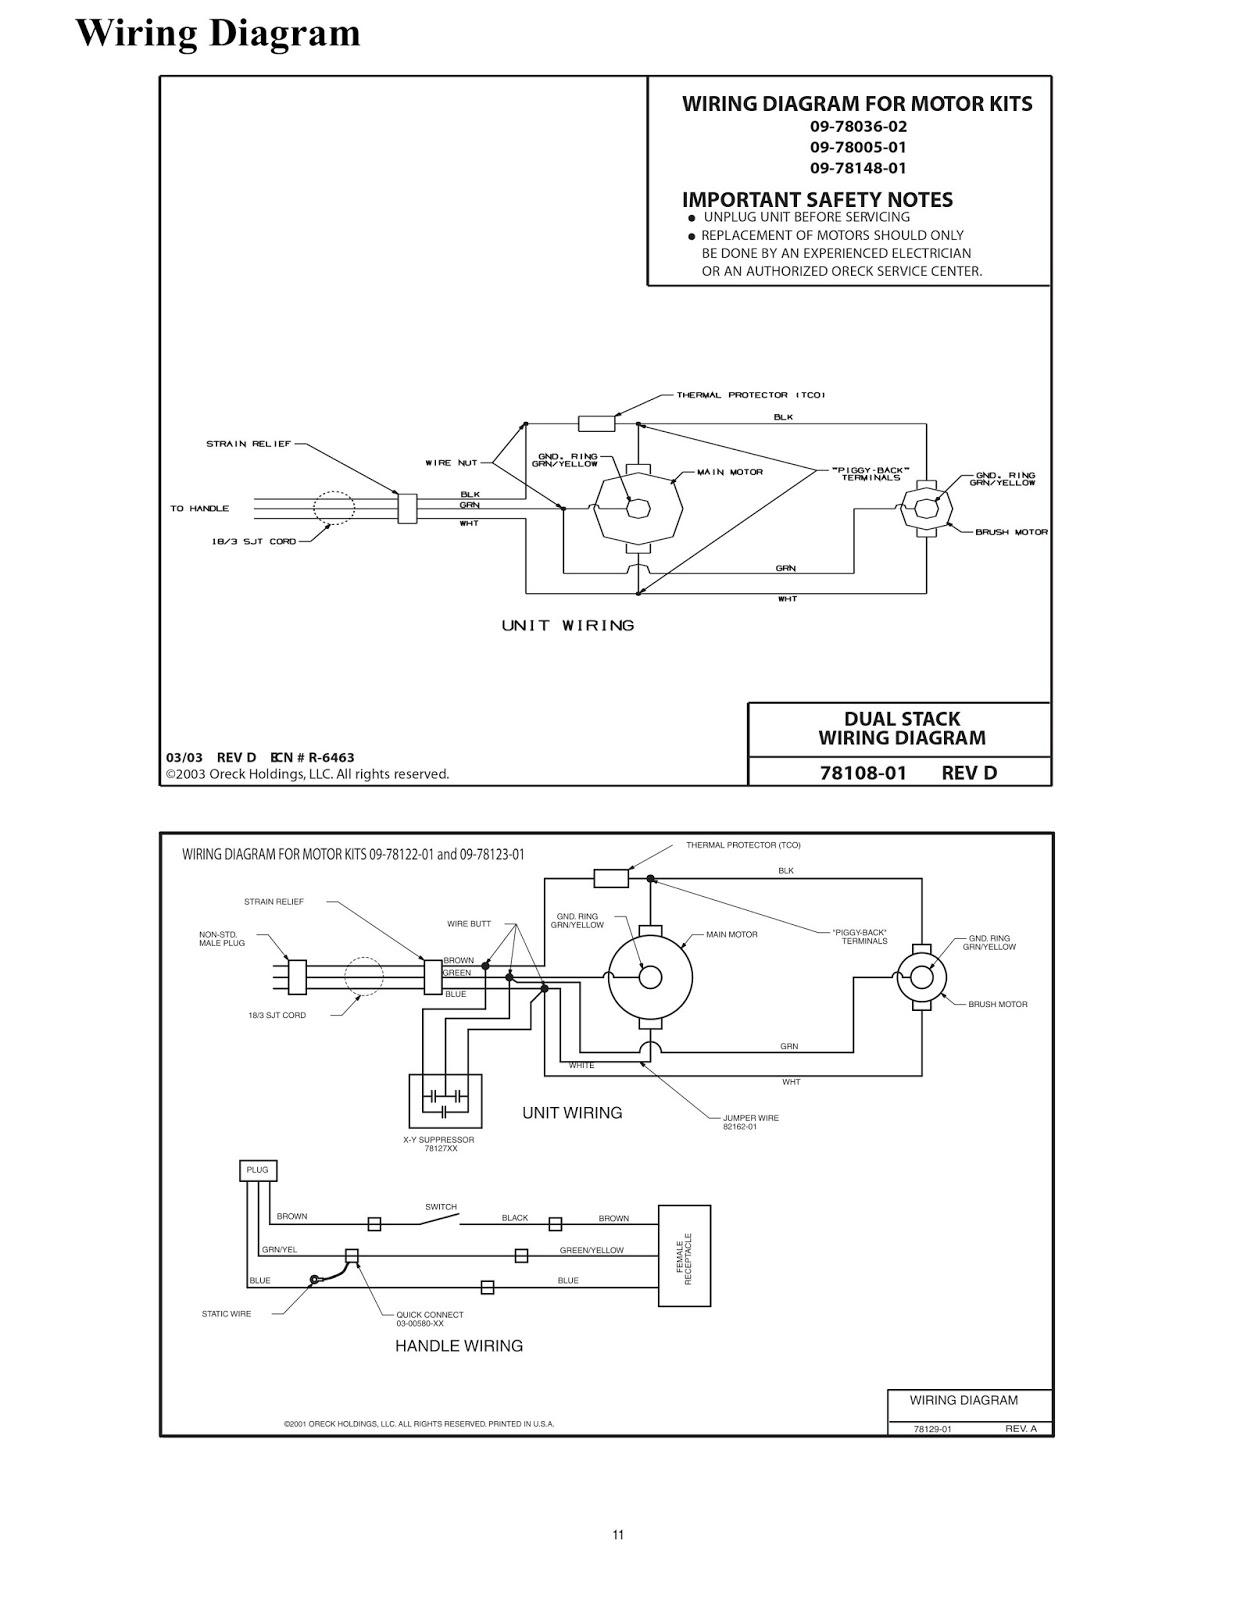 wiring diagram oreck xl3610hh schematic diagram downloadwiring diagram oreck xl3610hh wiring diagramoreck vacuum cleaner wiring diagram [ 1237 x 1600 Pixel ]